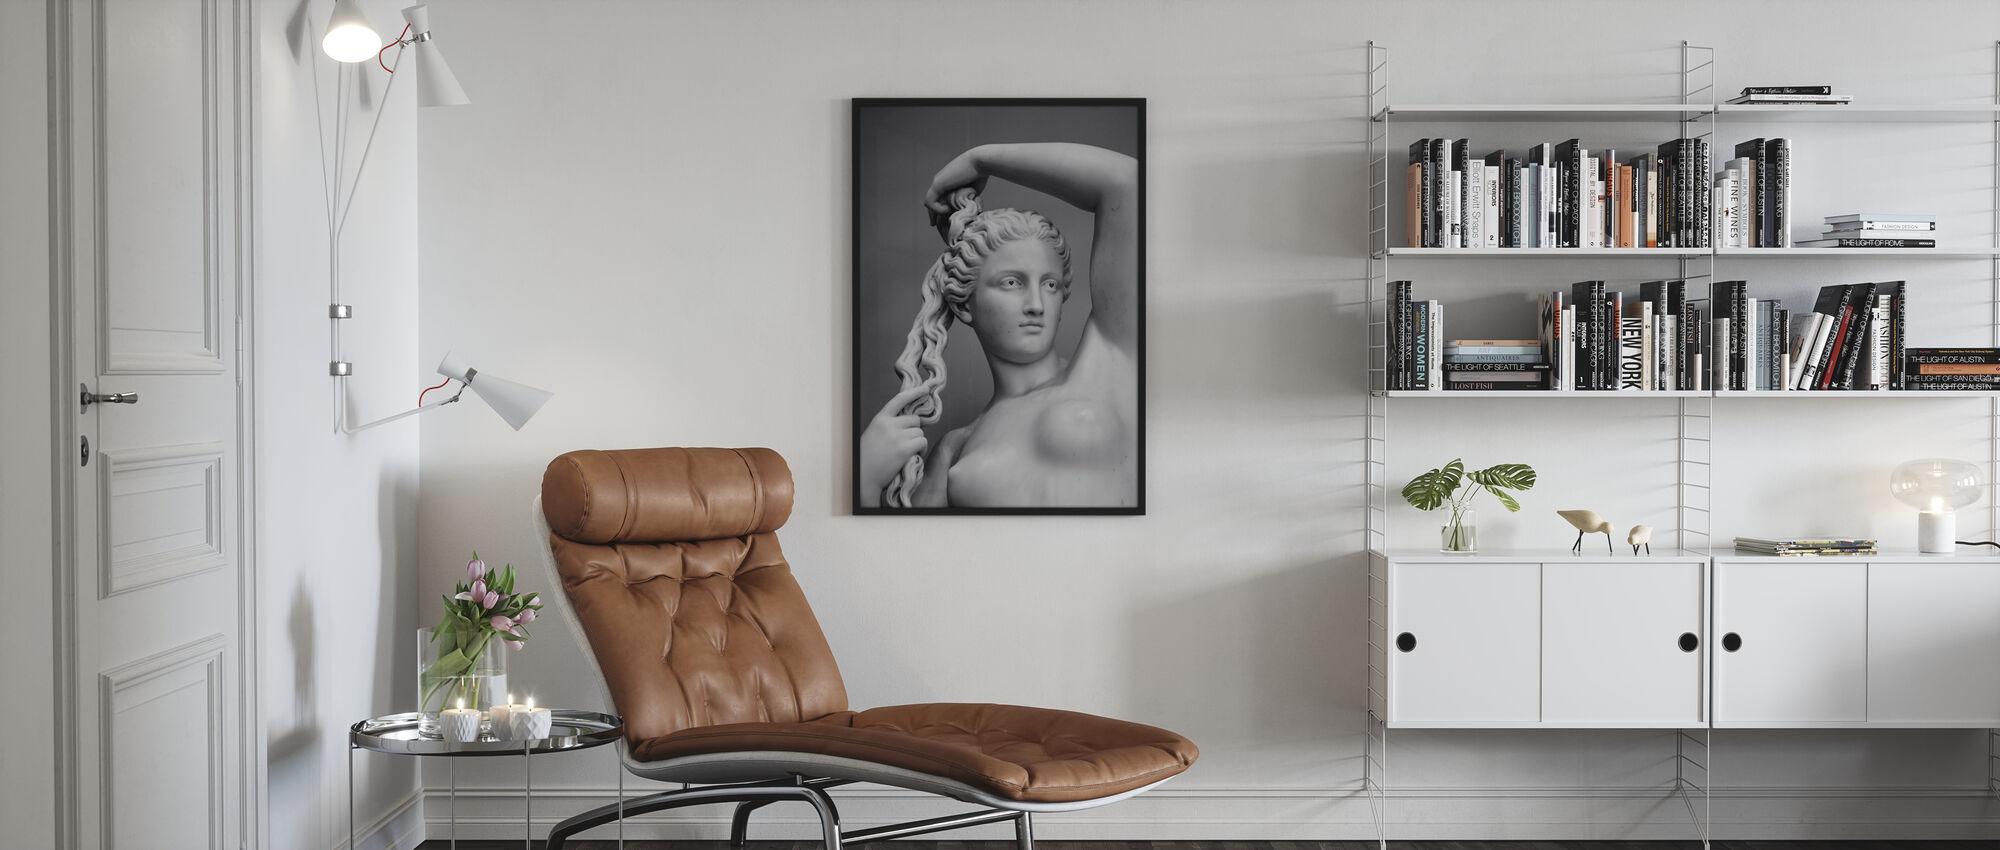 Liefde Godin - Ingelijste print - Woonkamer